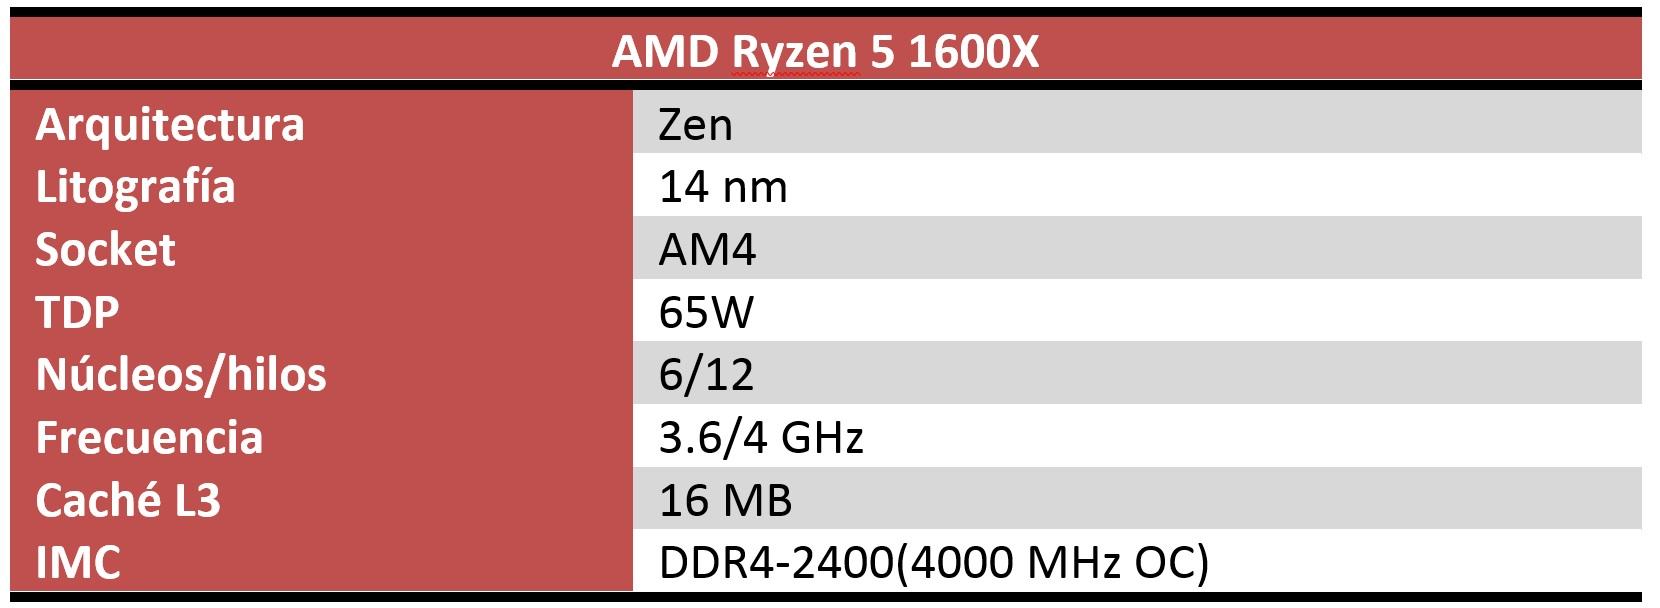 AMD Ryzen 5 1600X caracteristicas